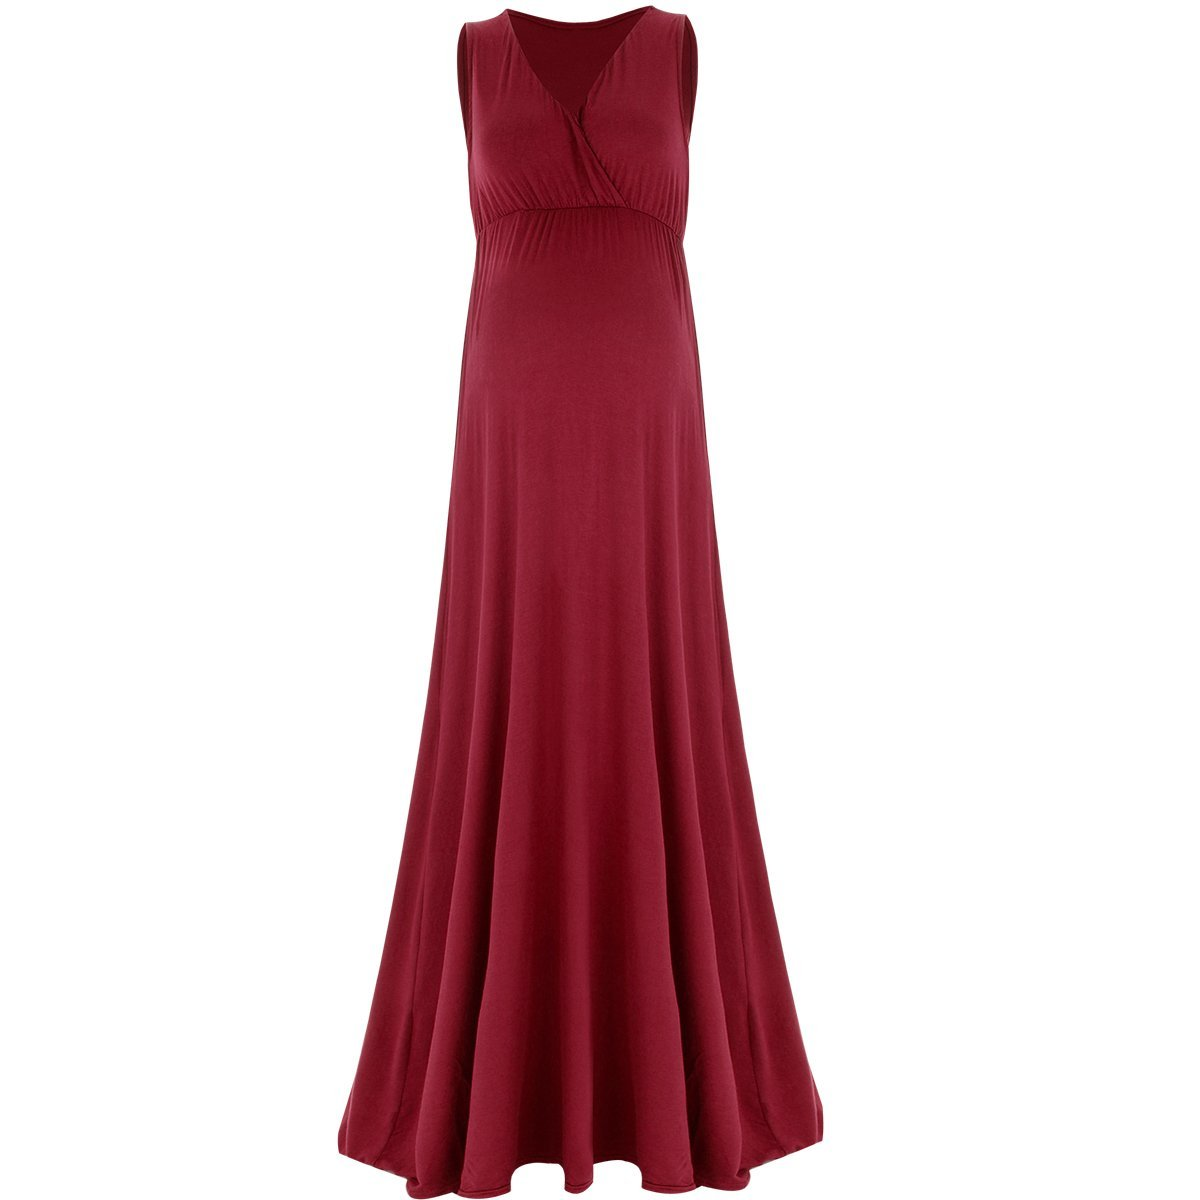 IWEMEK Women Sleeveless Ruched V Neck Maternity Dress Photo Shoot Long Maxi Gown